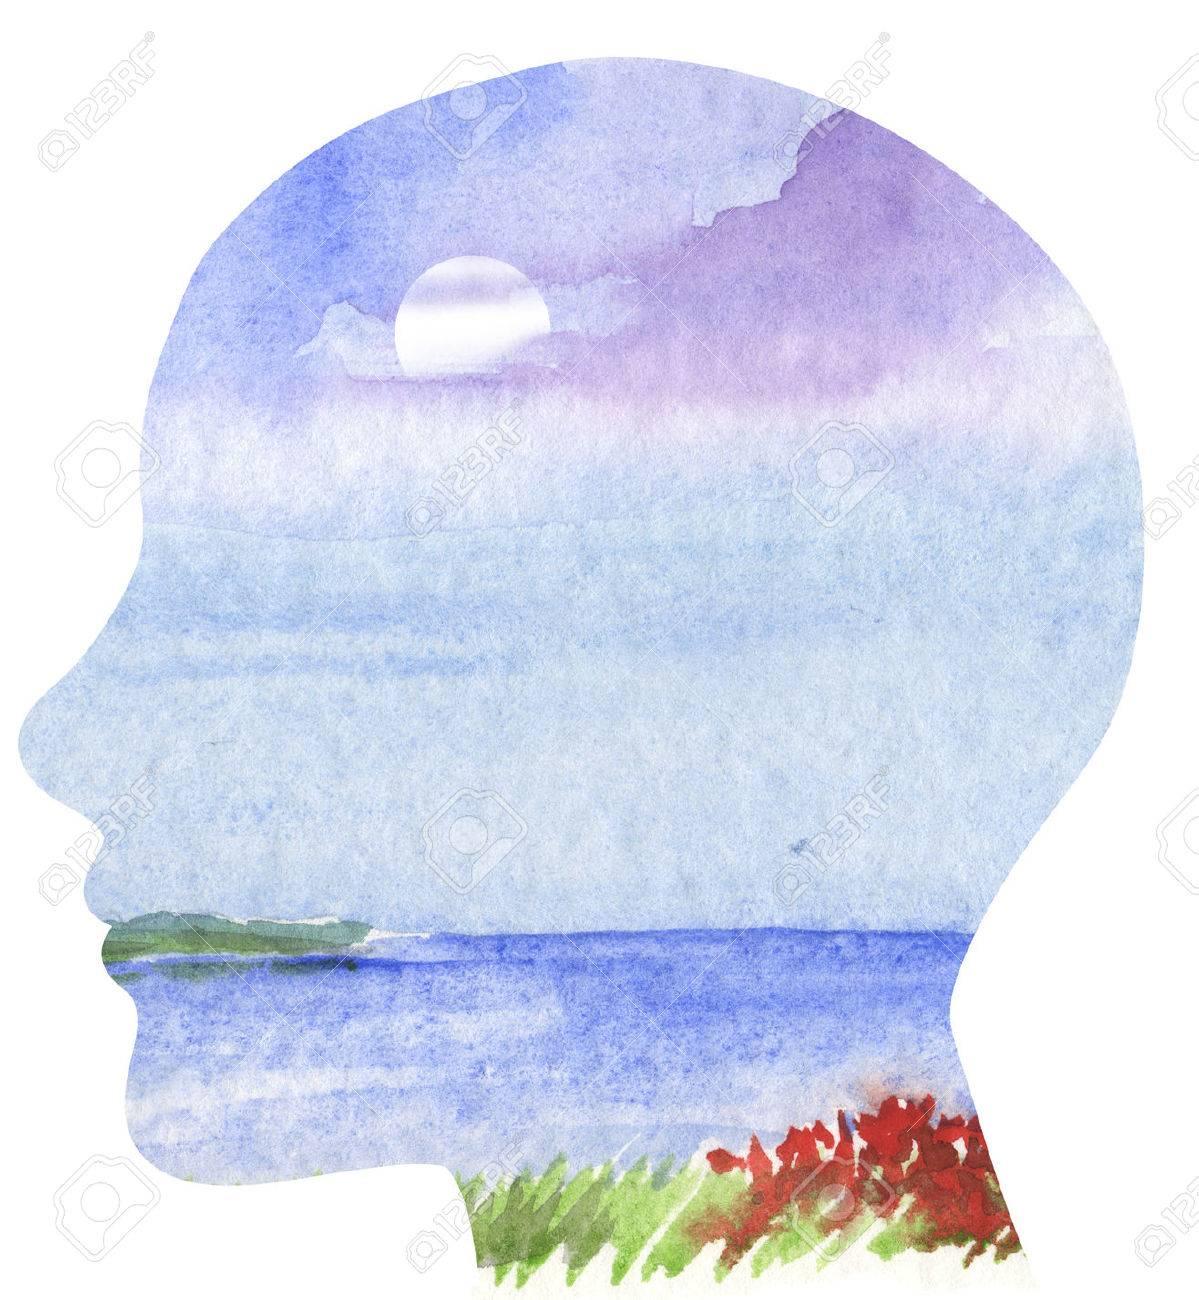 Human profile with sea landscape - 34309695